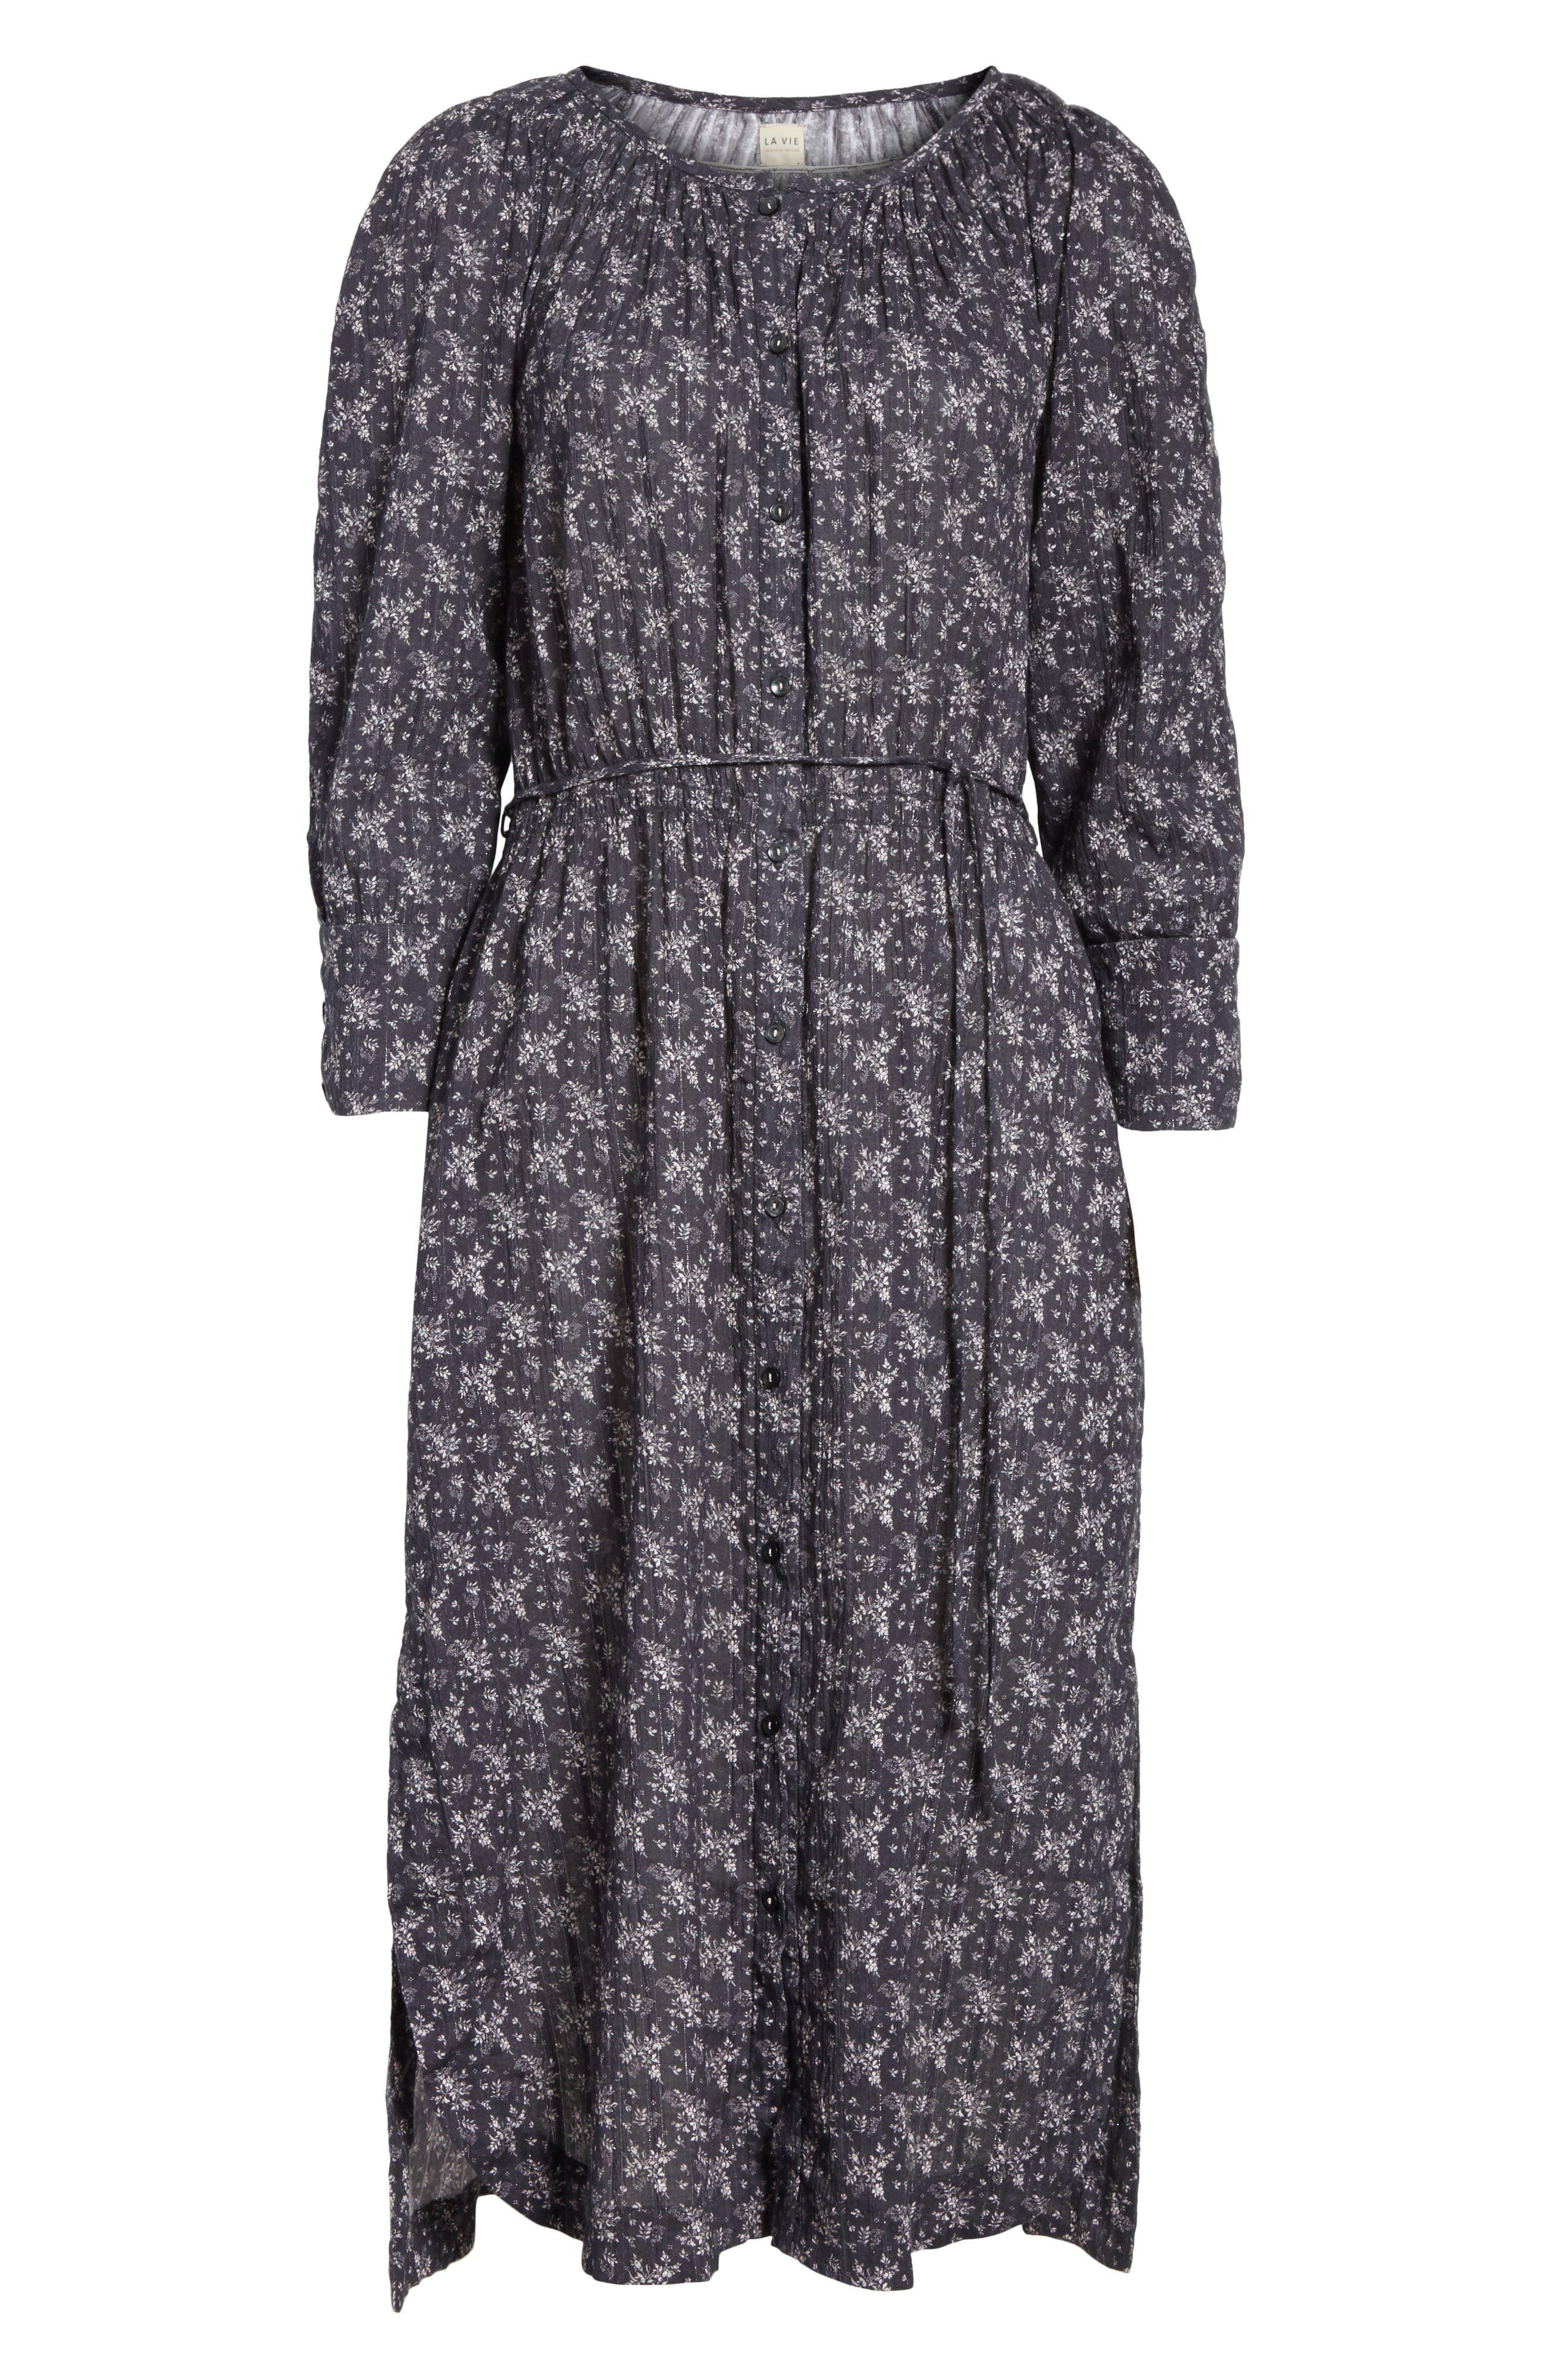 Angelique Long Sleeve Dress,                             Alternate thumbnail 6, color,                             014